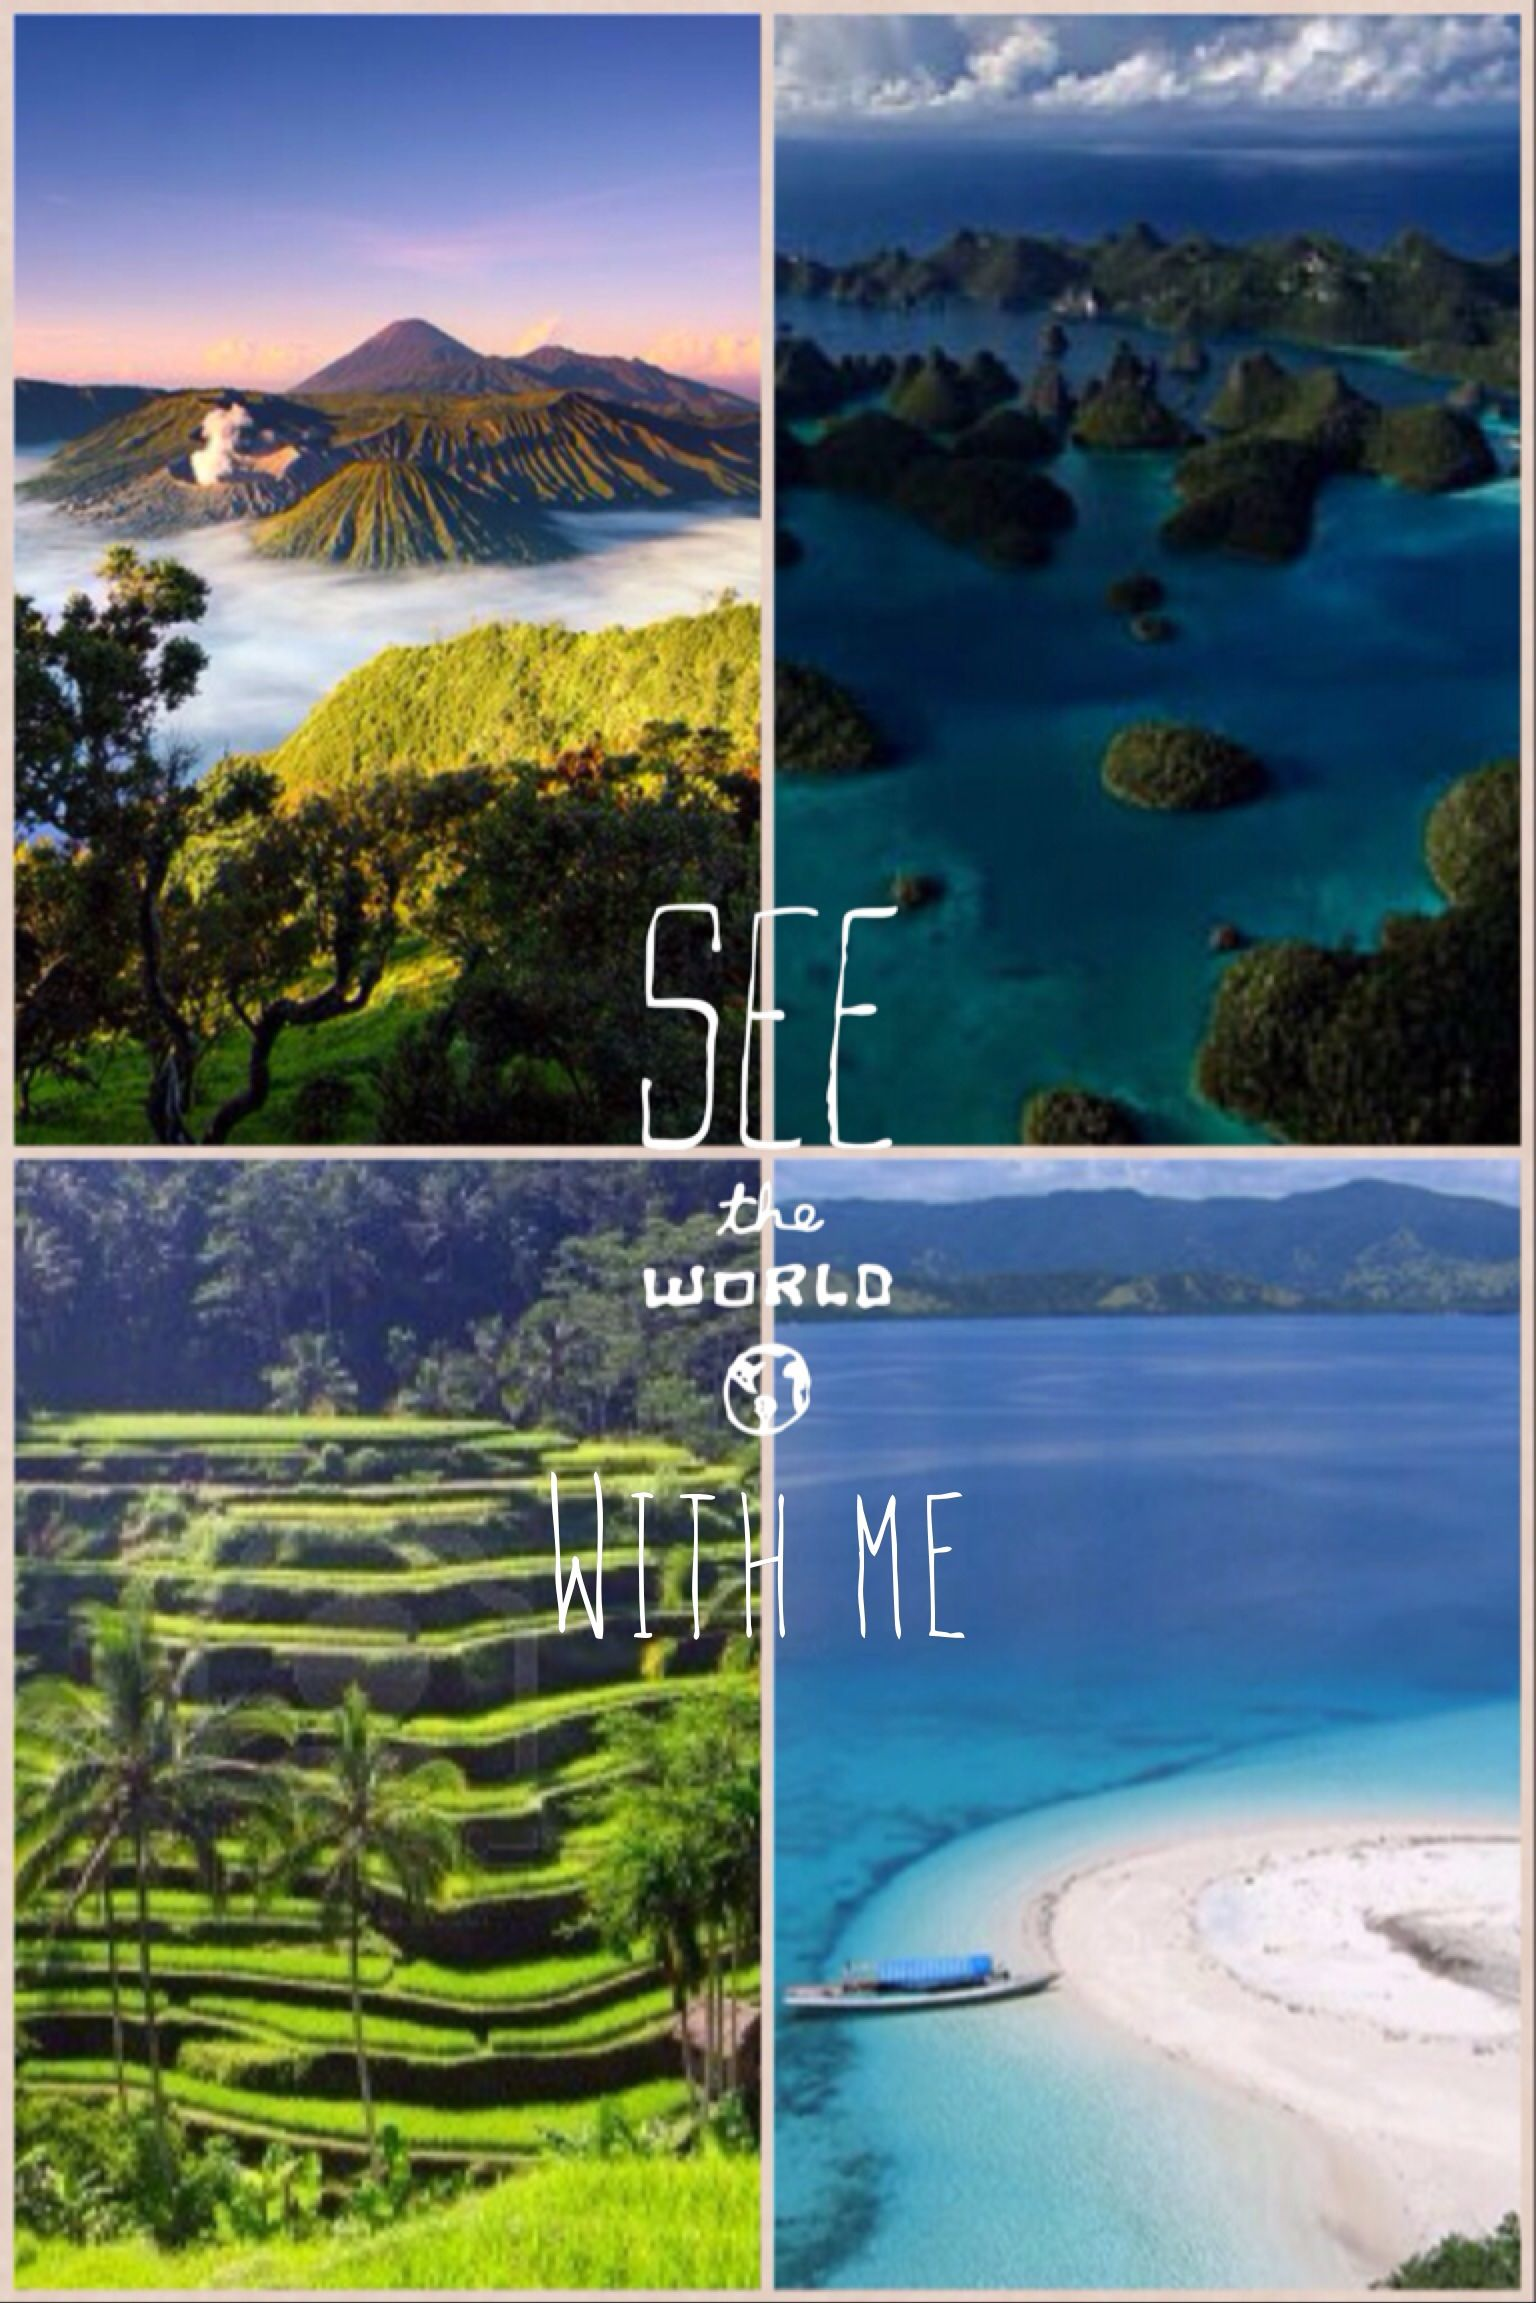 http://www.bestjobaroundtheworld.com/votes/add/15352 #vote #please #best #job #around #the #world! #jauntaroo#amsterdam #holland #netherlands #travel #beautiful #mountains #asia #usa #australia #europe #africa #southamerica #places #beach #help